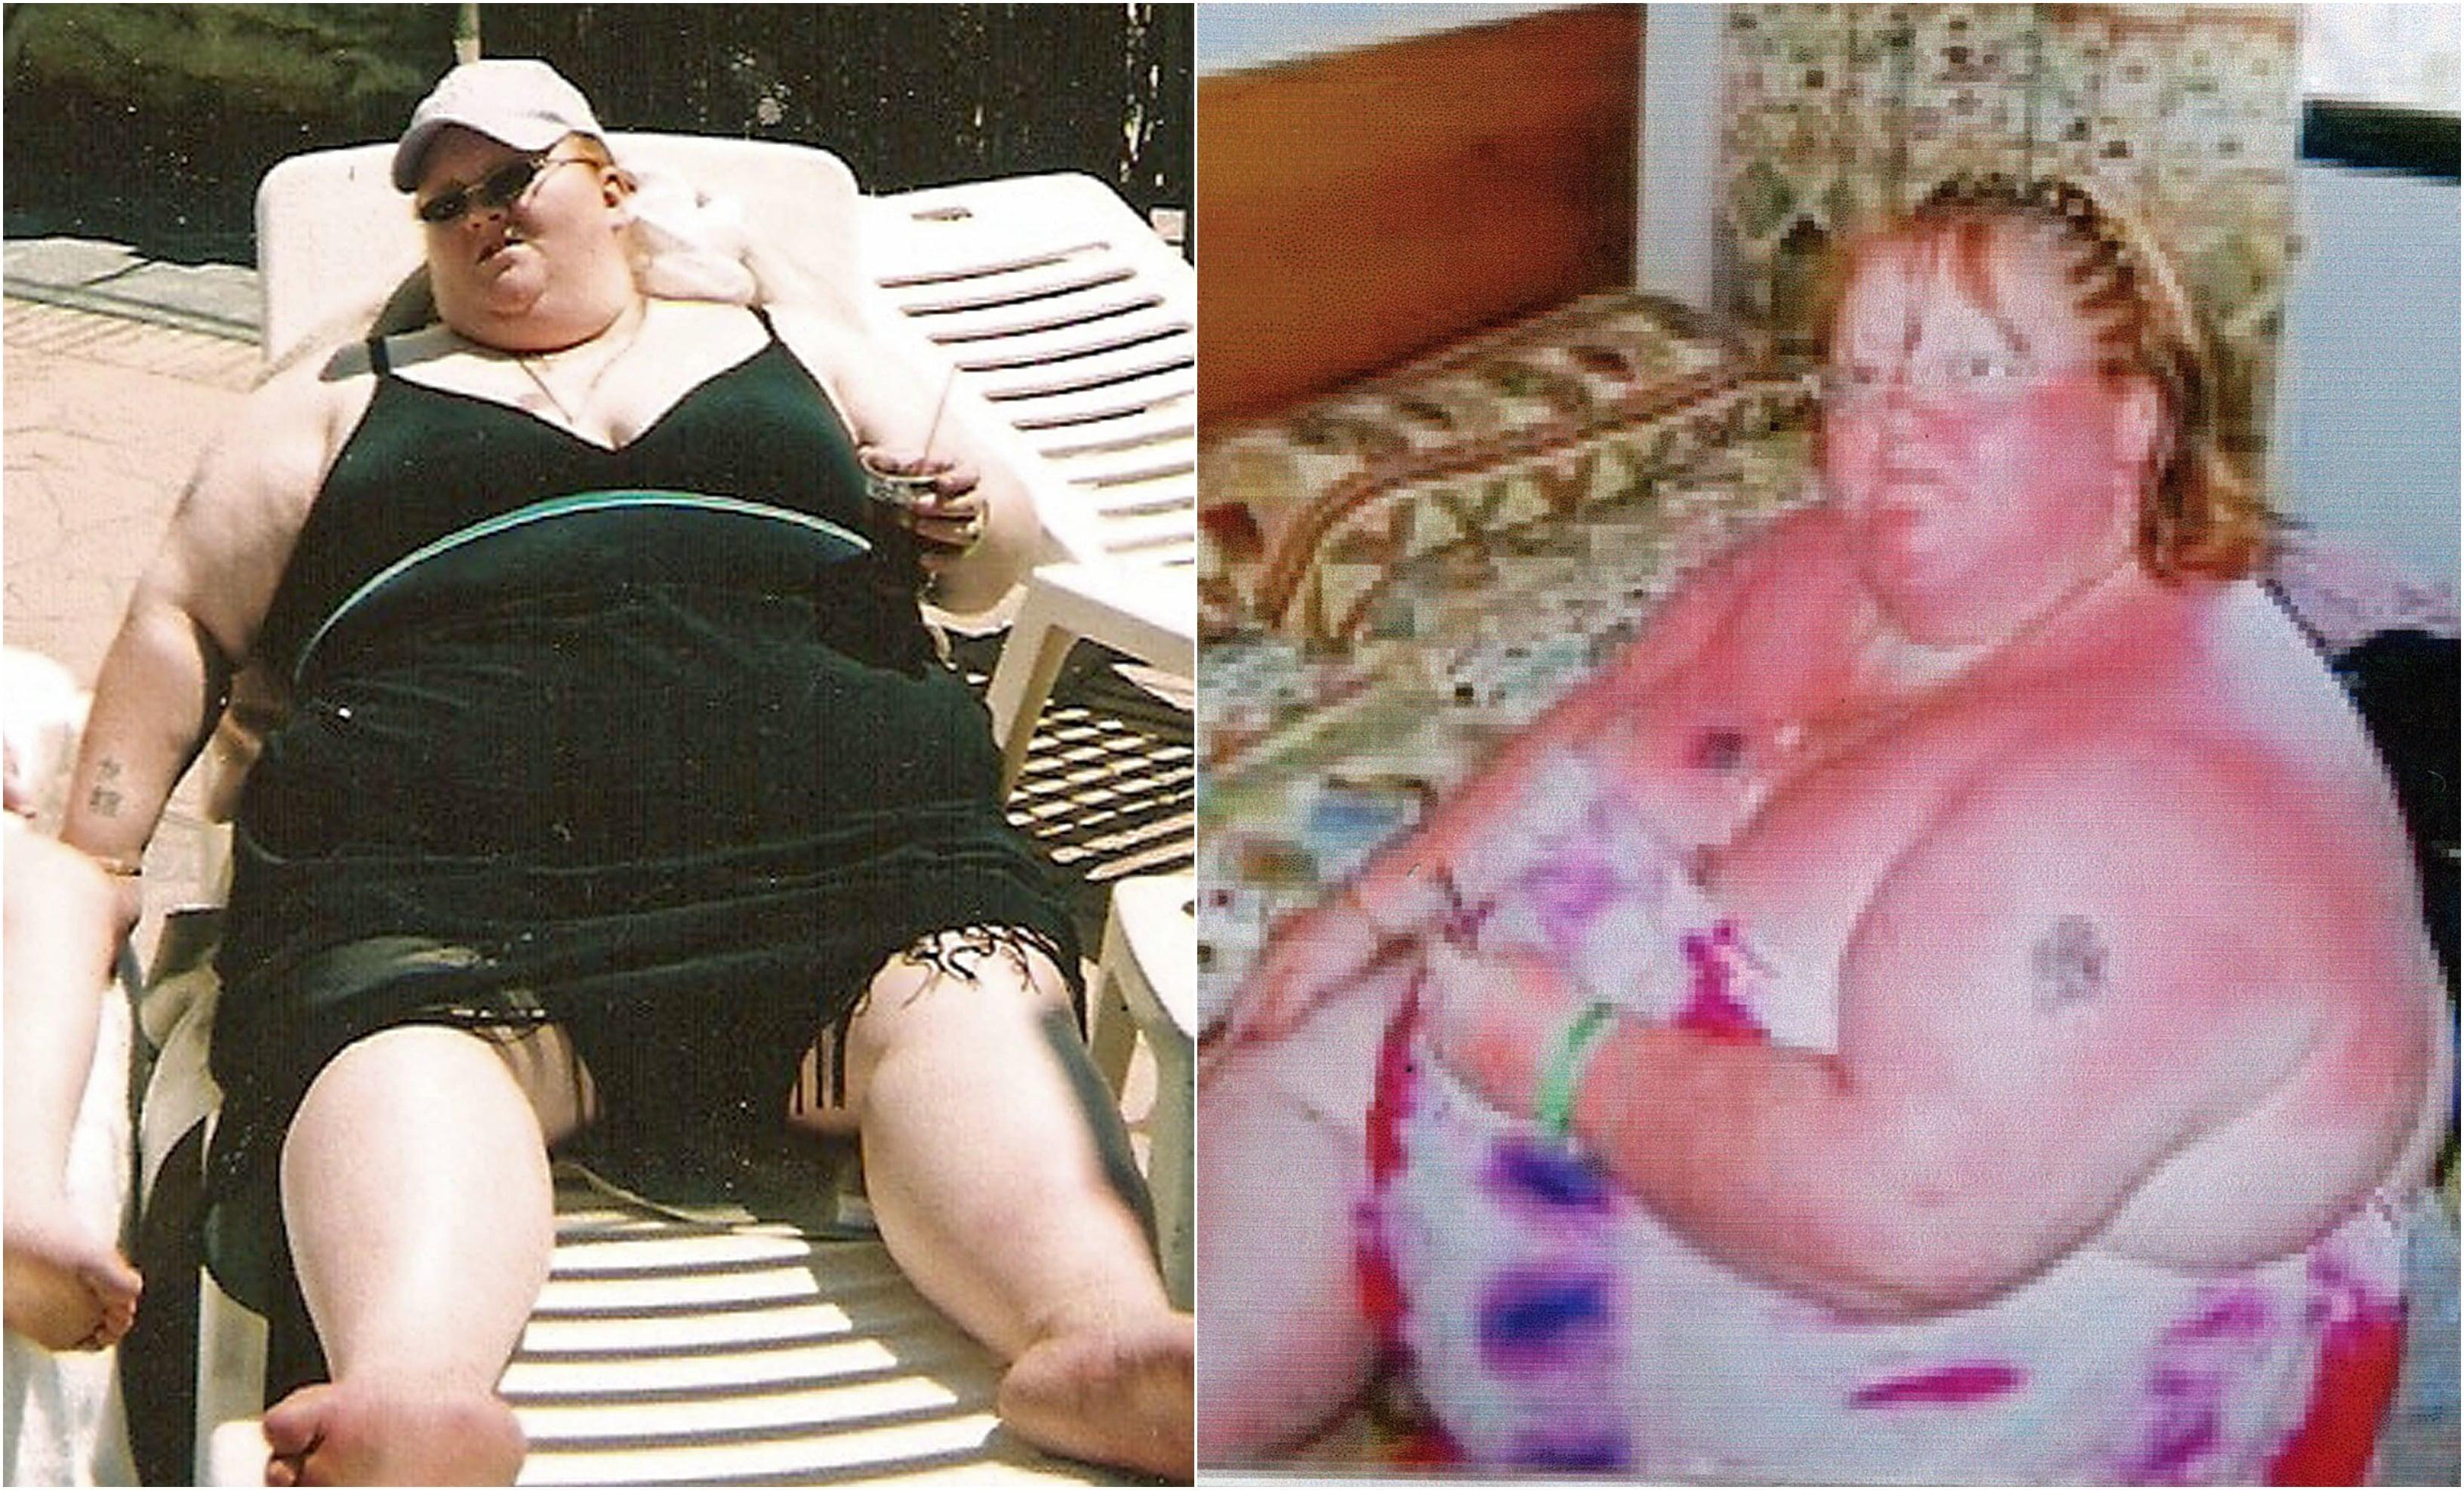 Colaj femeie slabit 190 kg